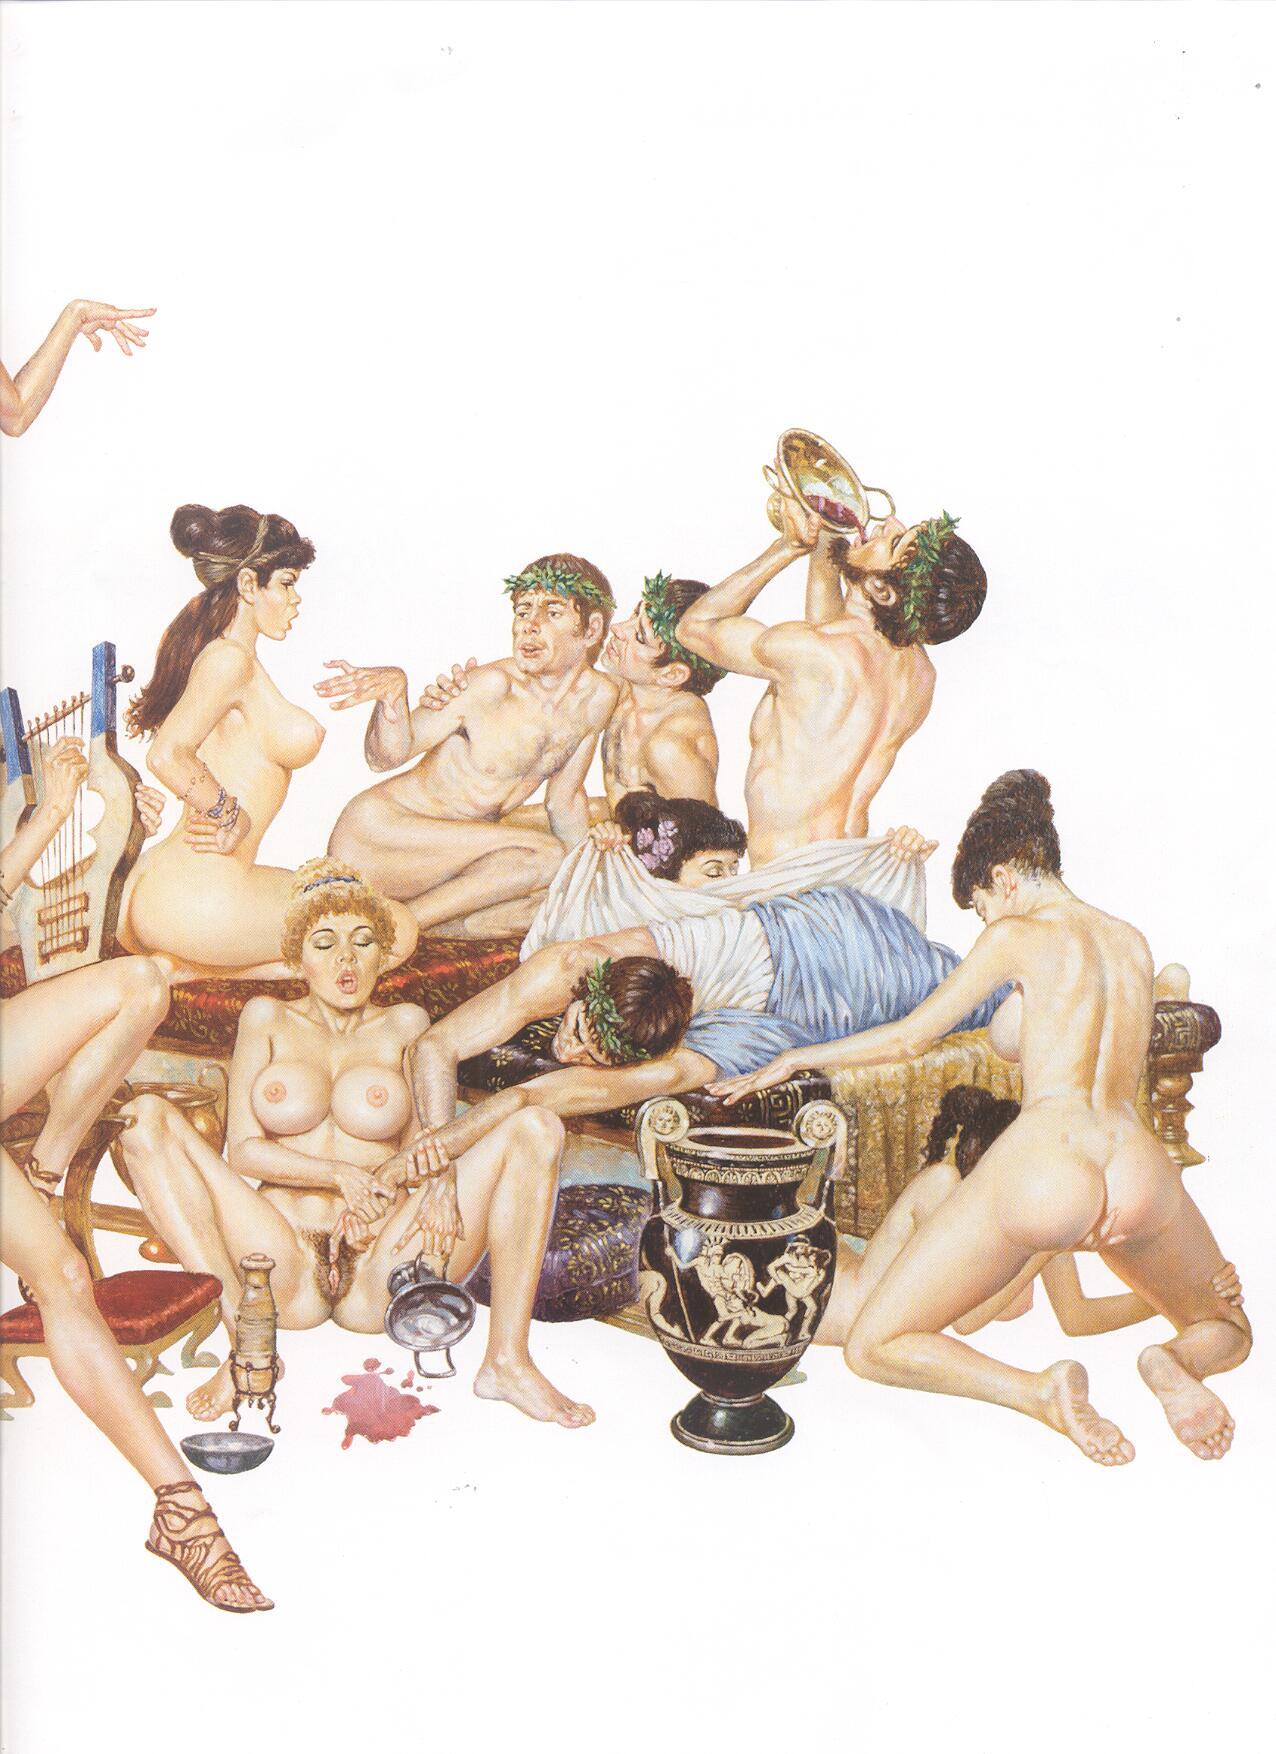 Showing xxx images for roman orgy xxx